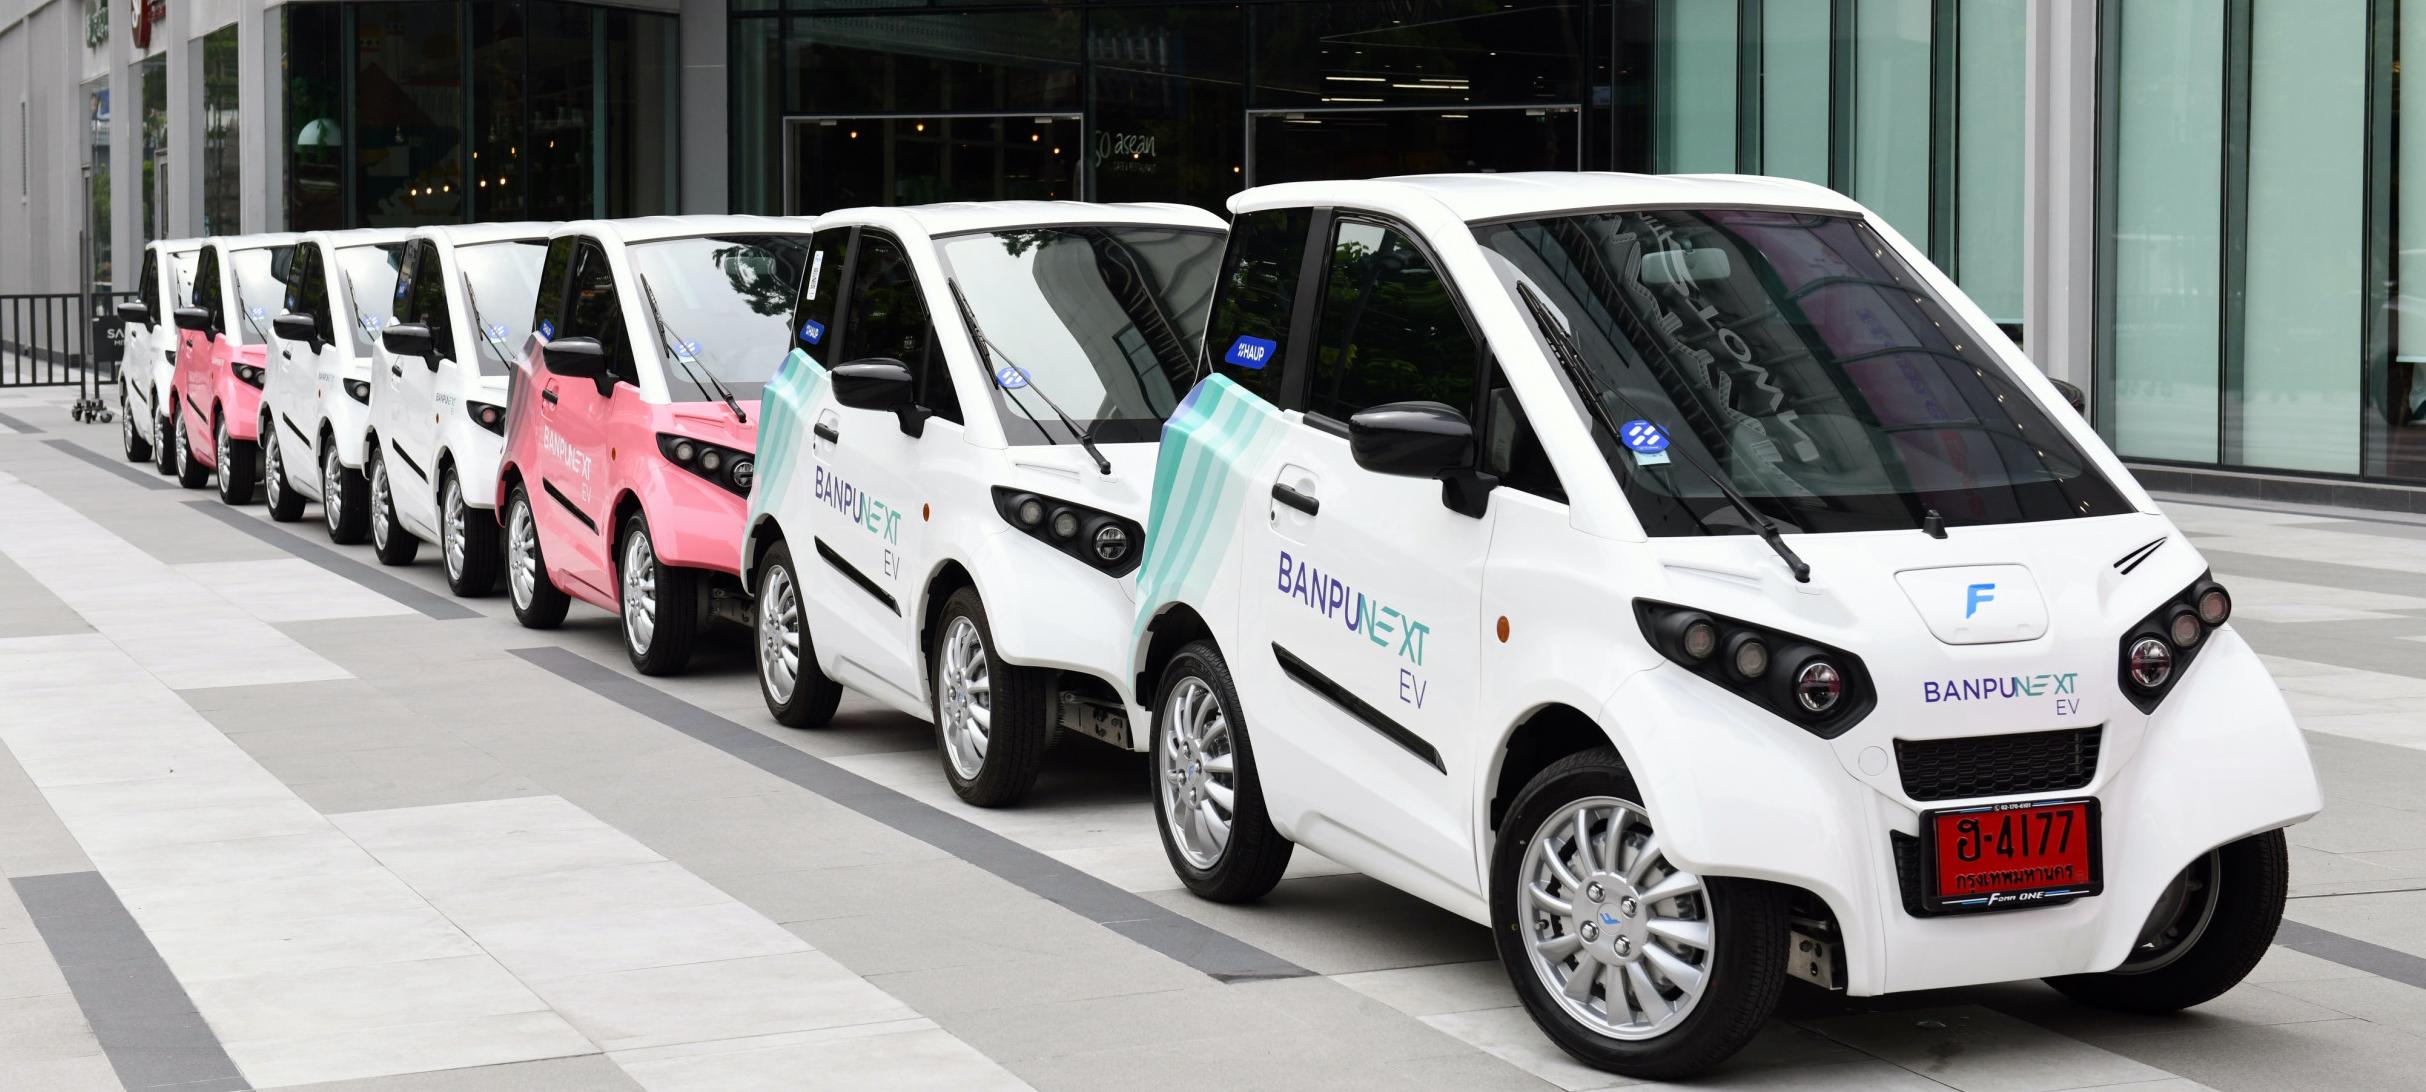 EV Car Sharing Service